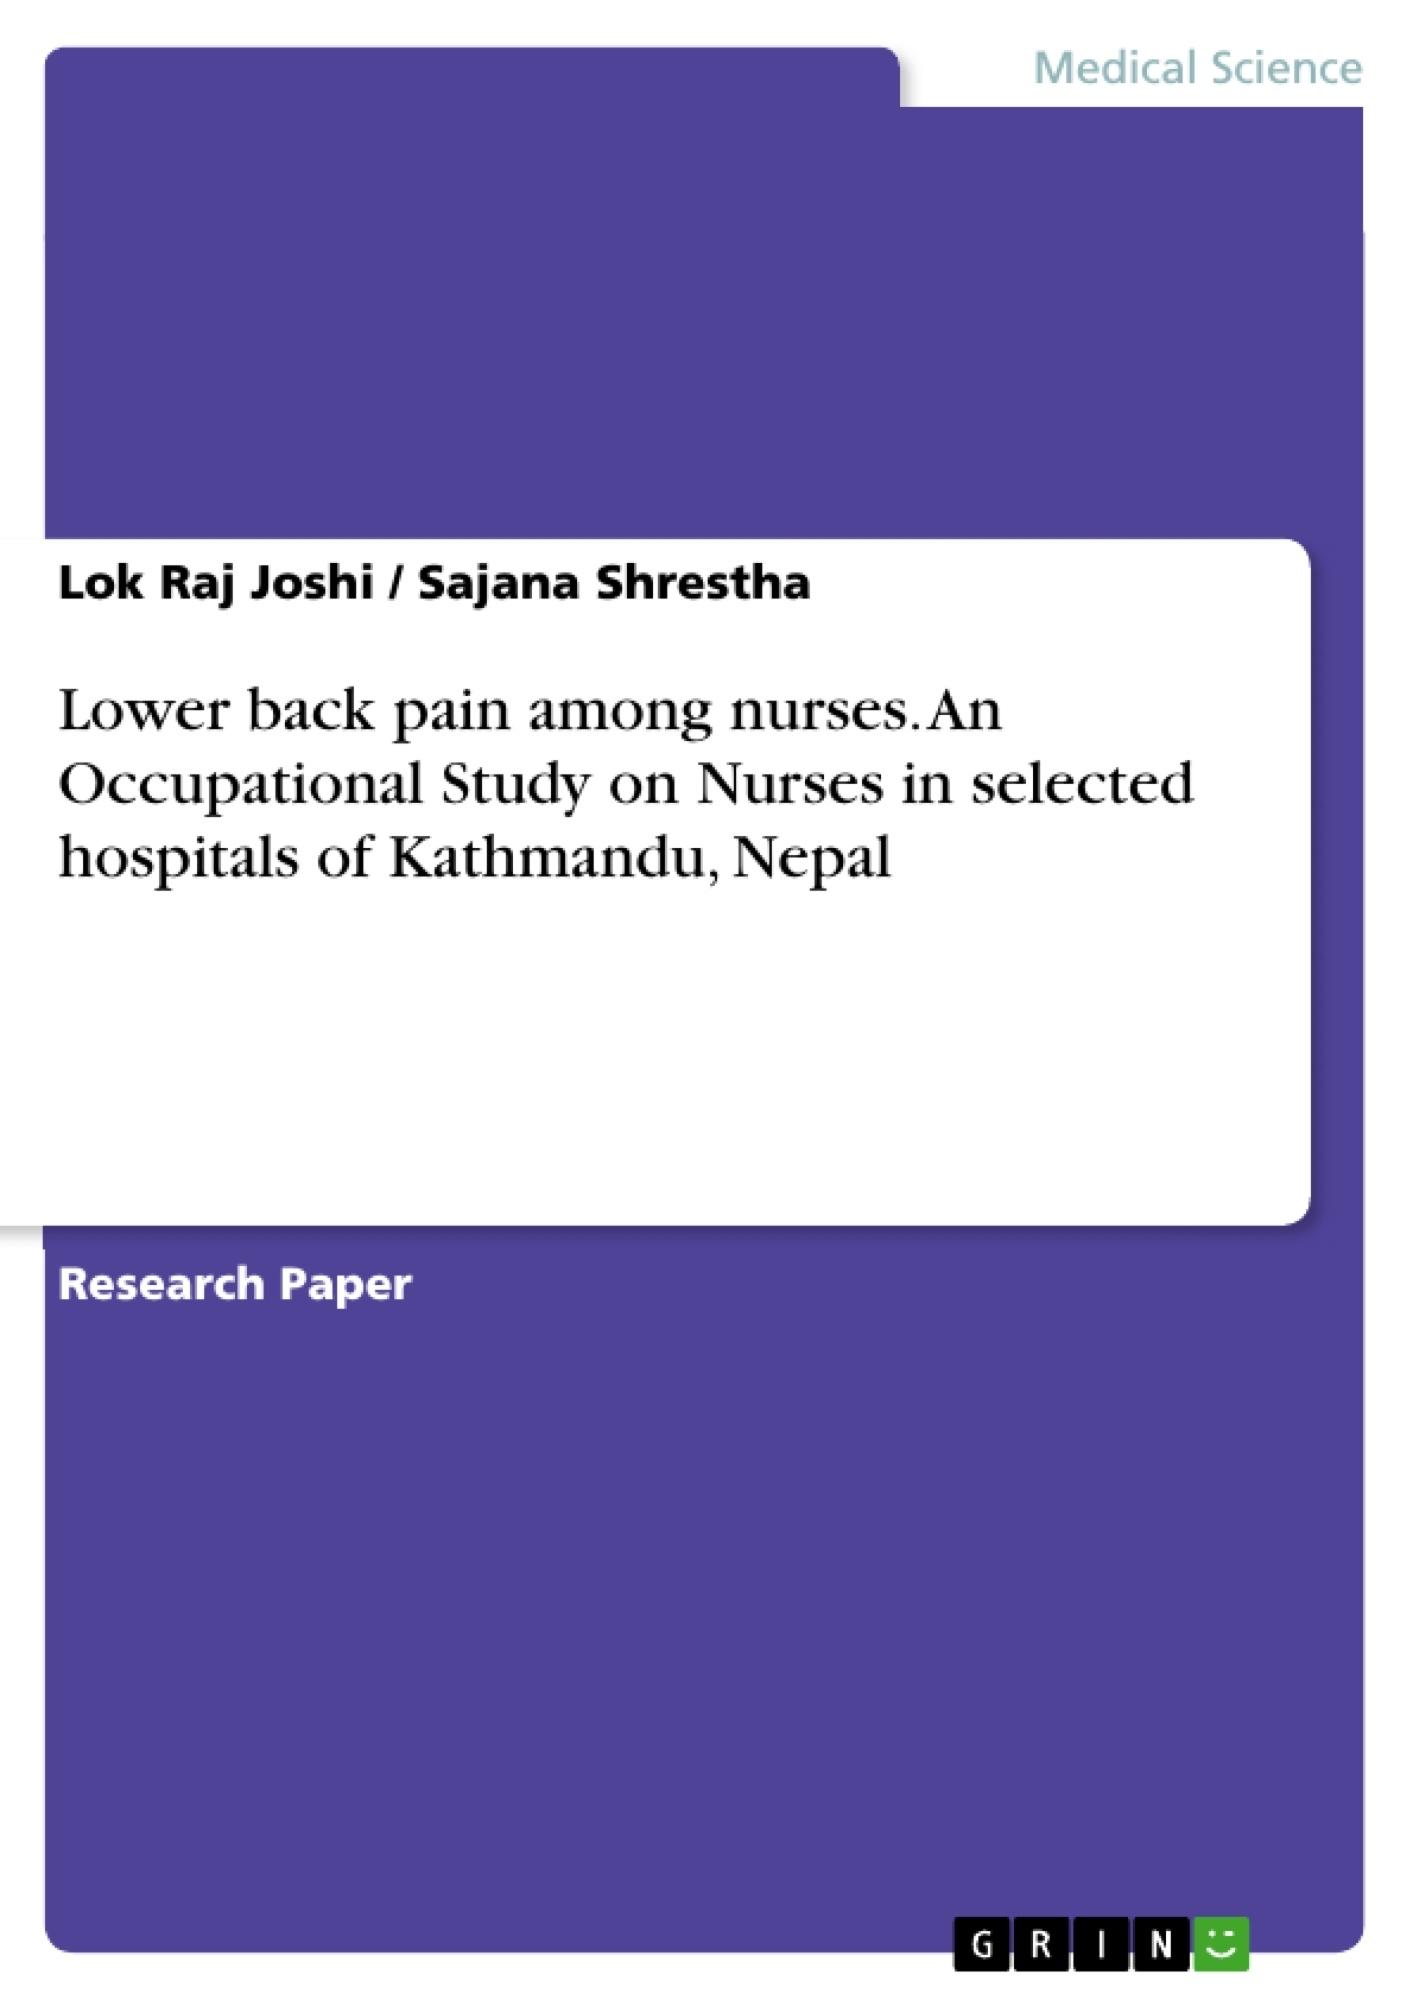 Title: Lower back pain among nurses. An Occupational Study on Nurses in selected hospitals of Kathmandu, Nepal